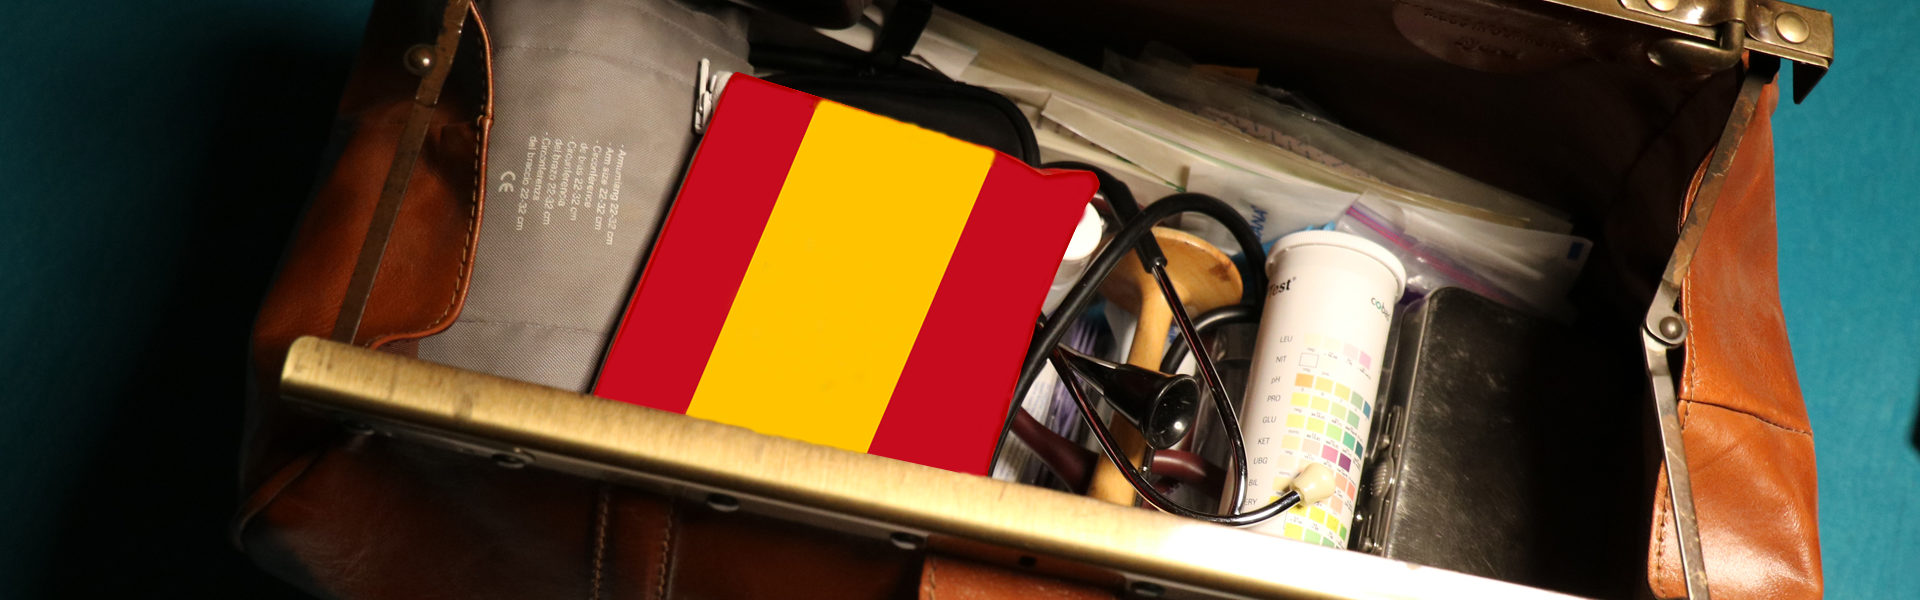 Spanien, Hebamme, Hebammentasche